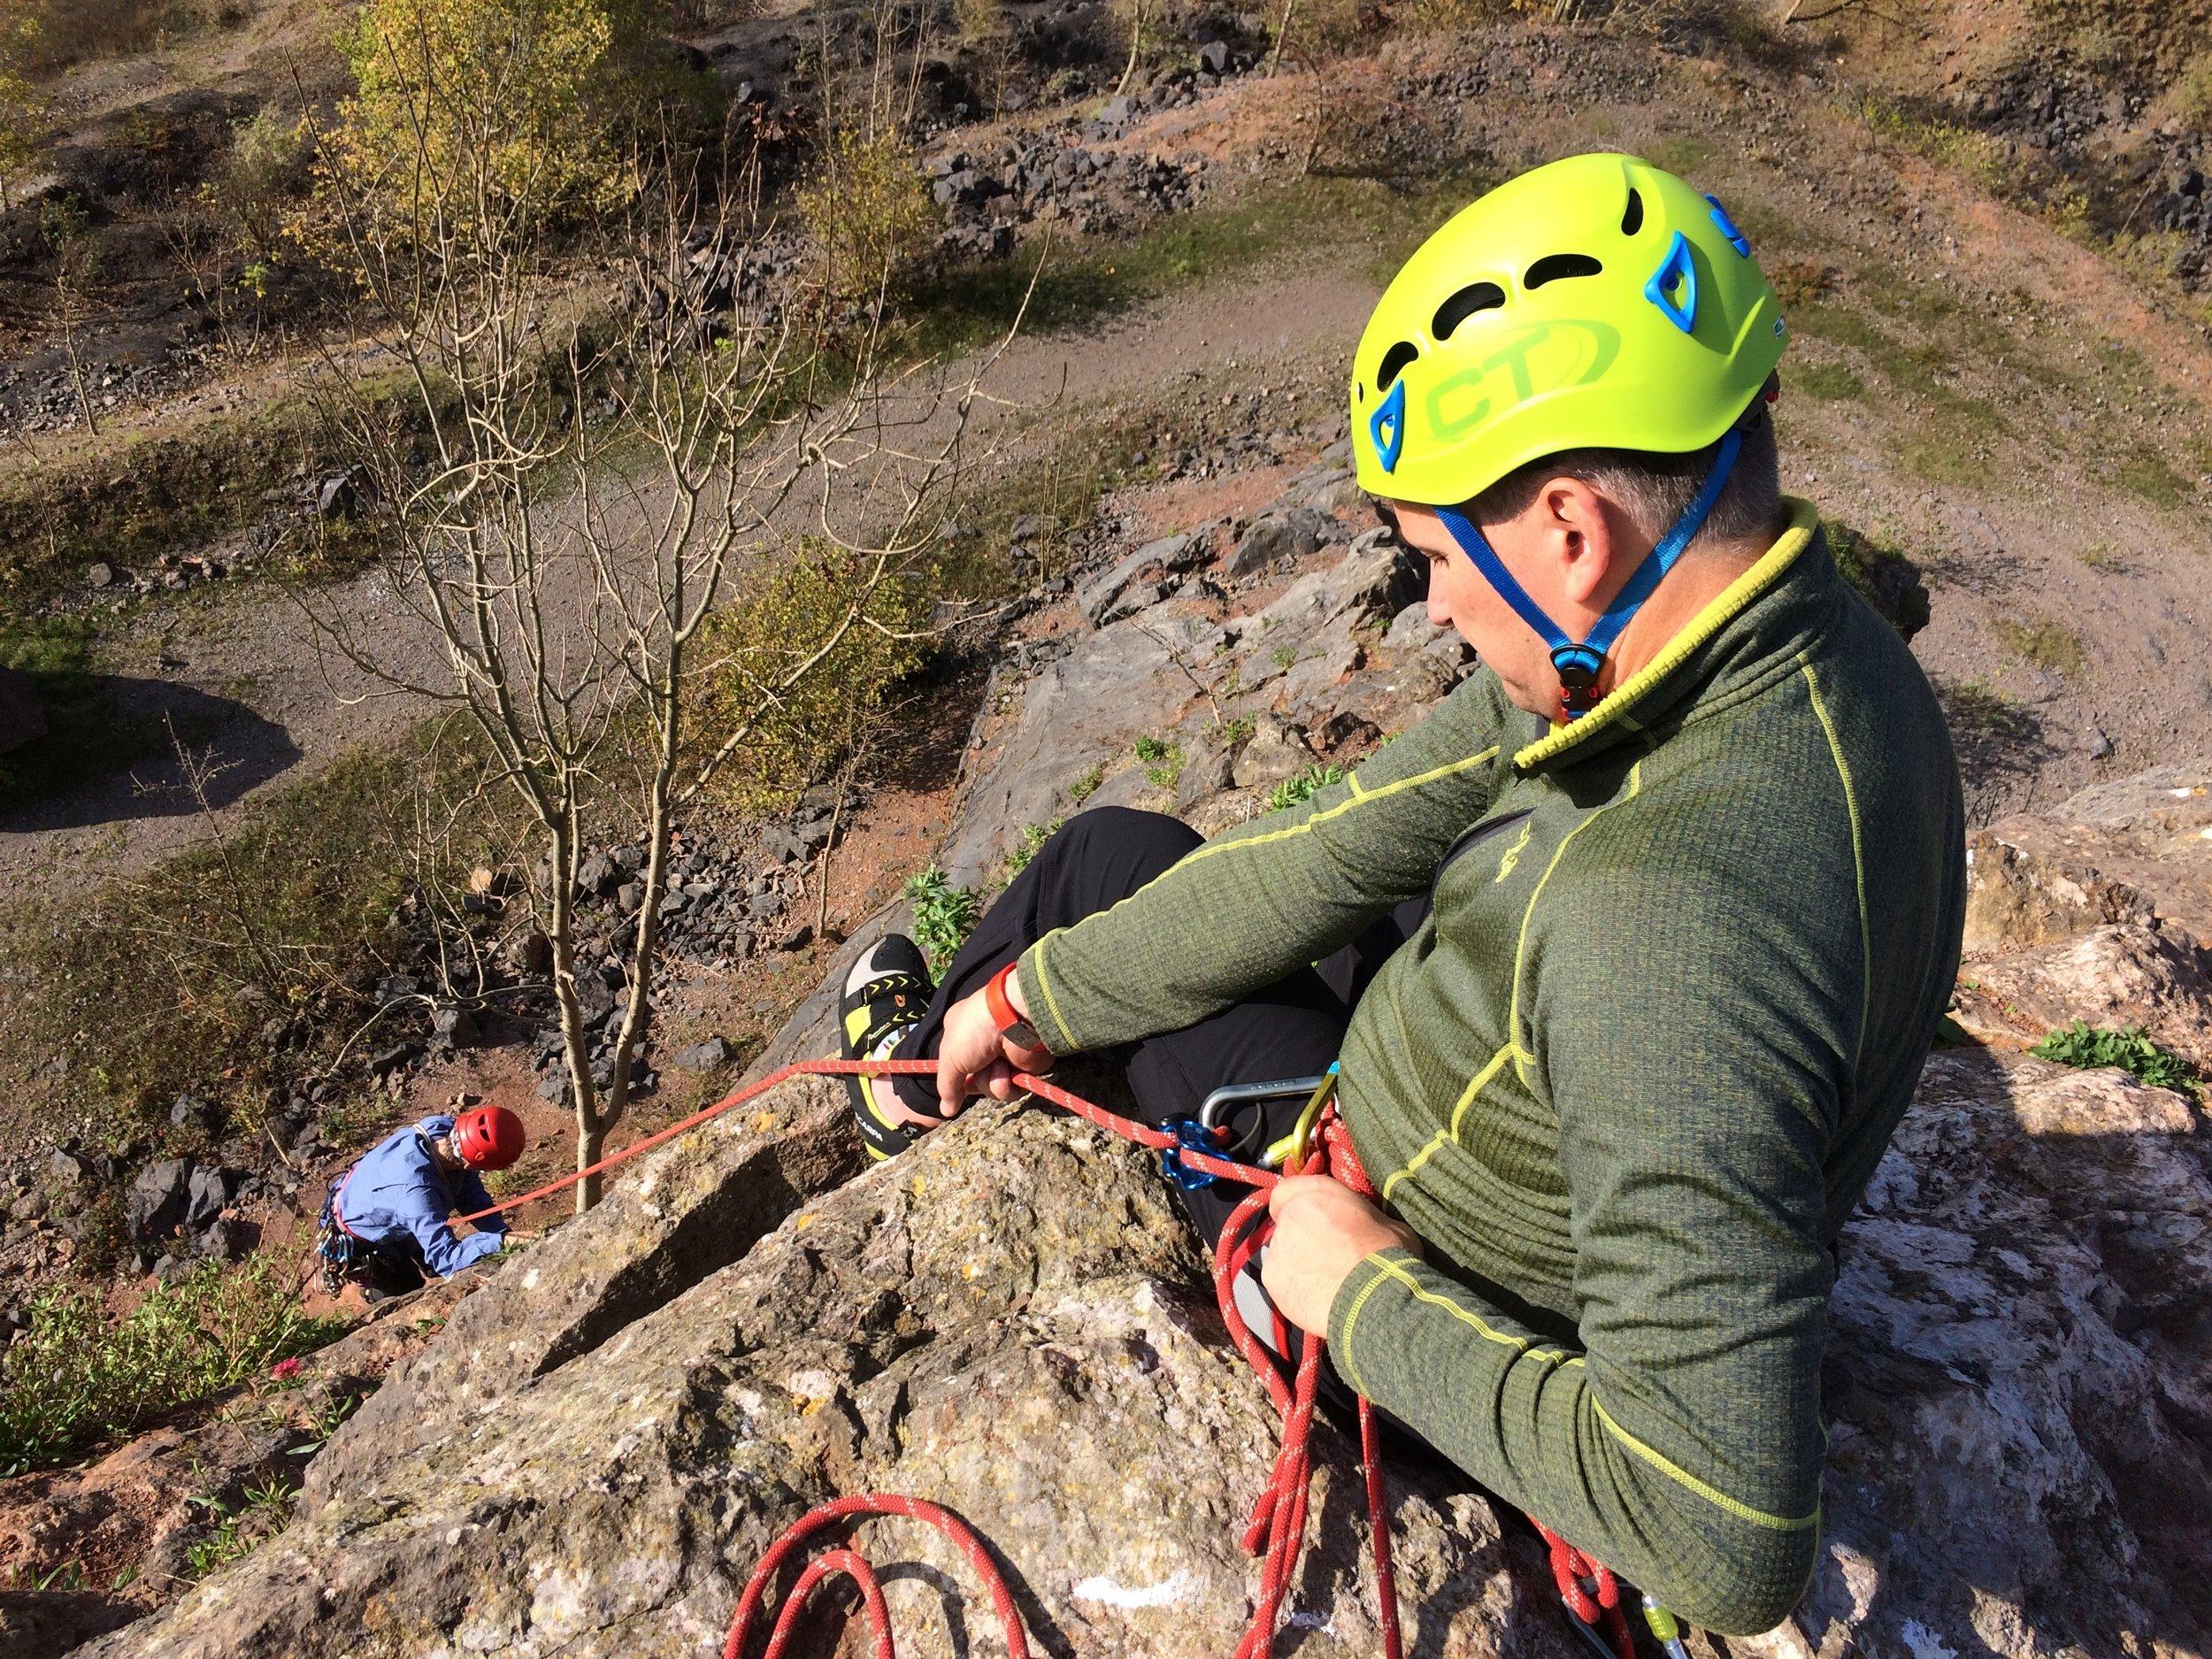 Bespoke Climbing Instruction